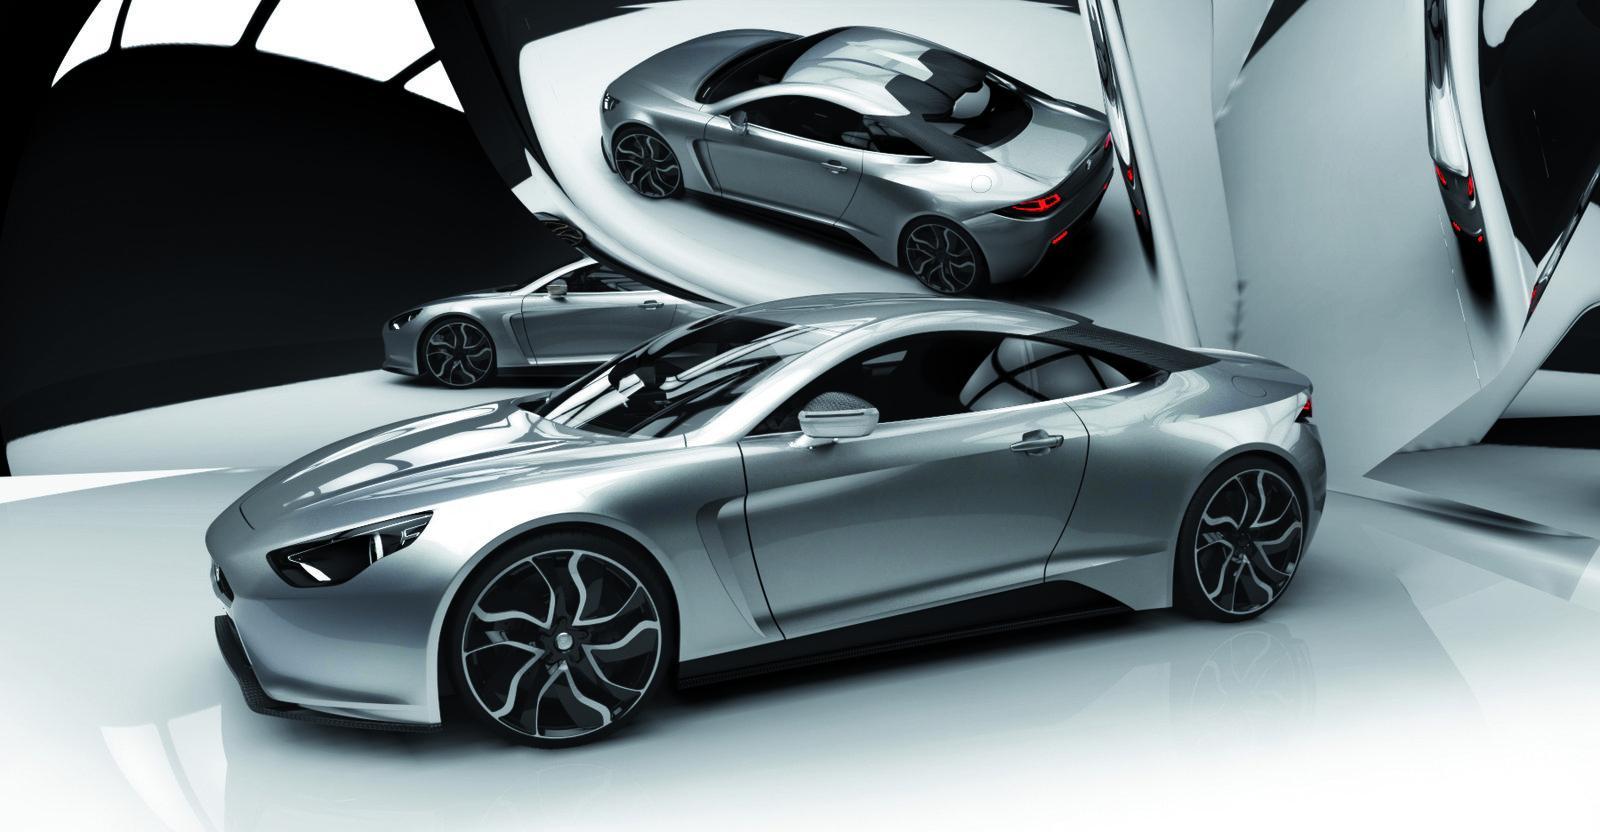 Exagon Motors Furtive Egt Production Version Revealed